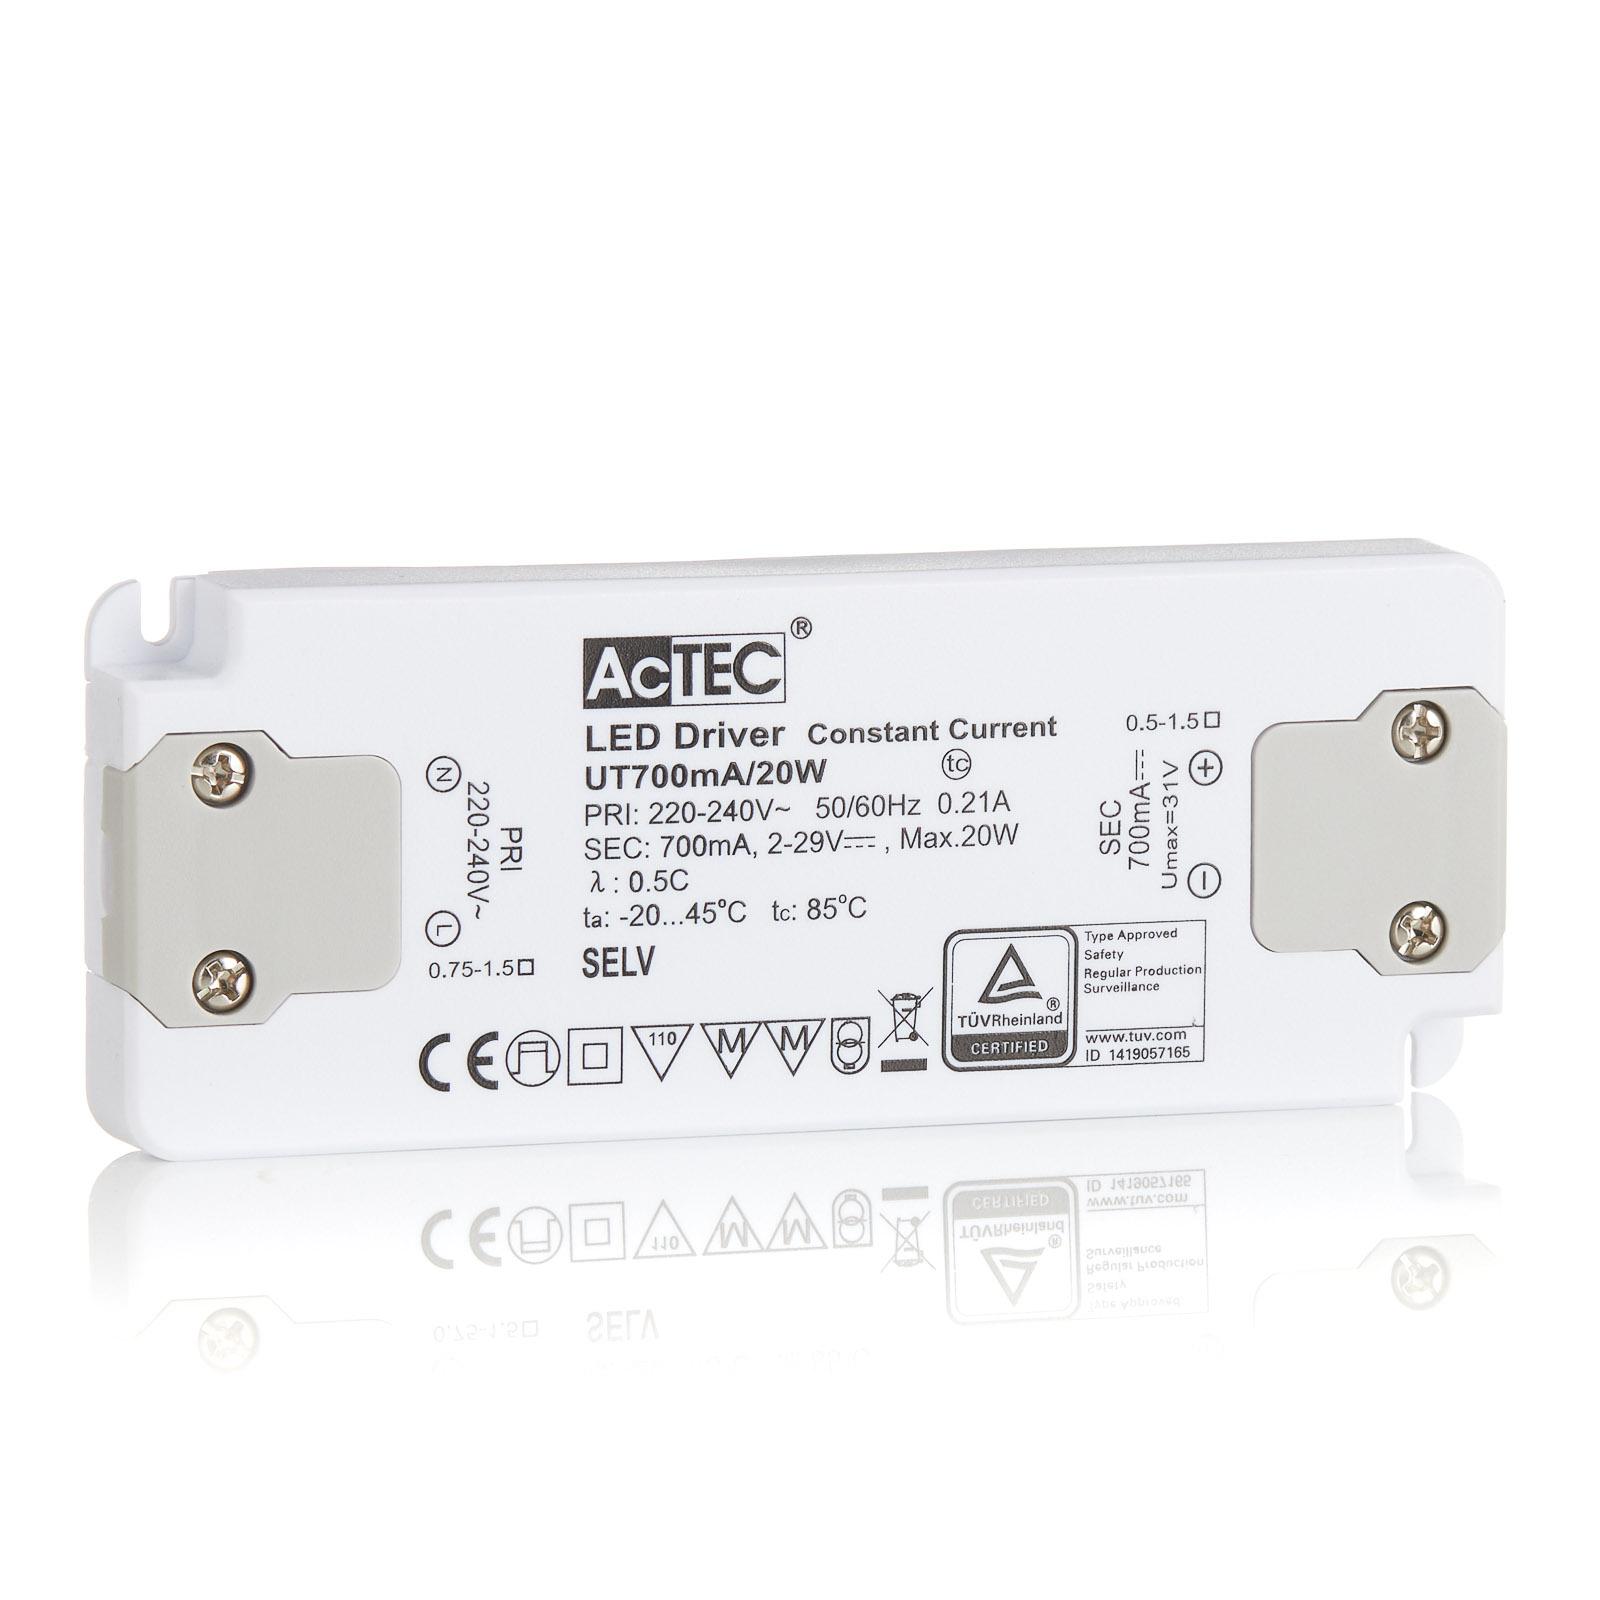 AcTEC Slim LED driver CC 700mA, 20W